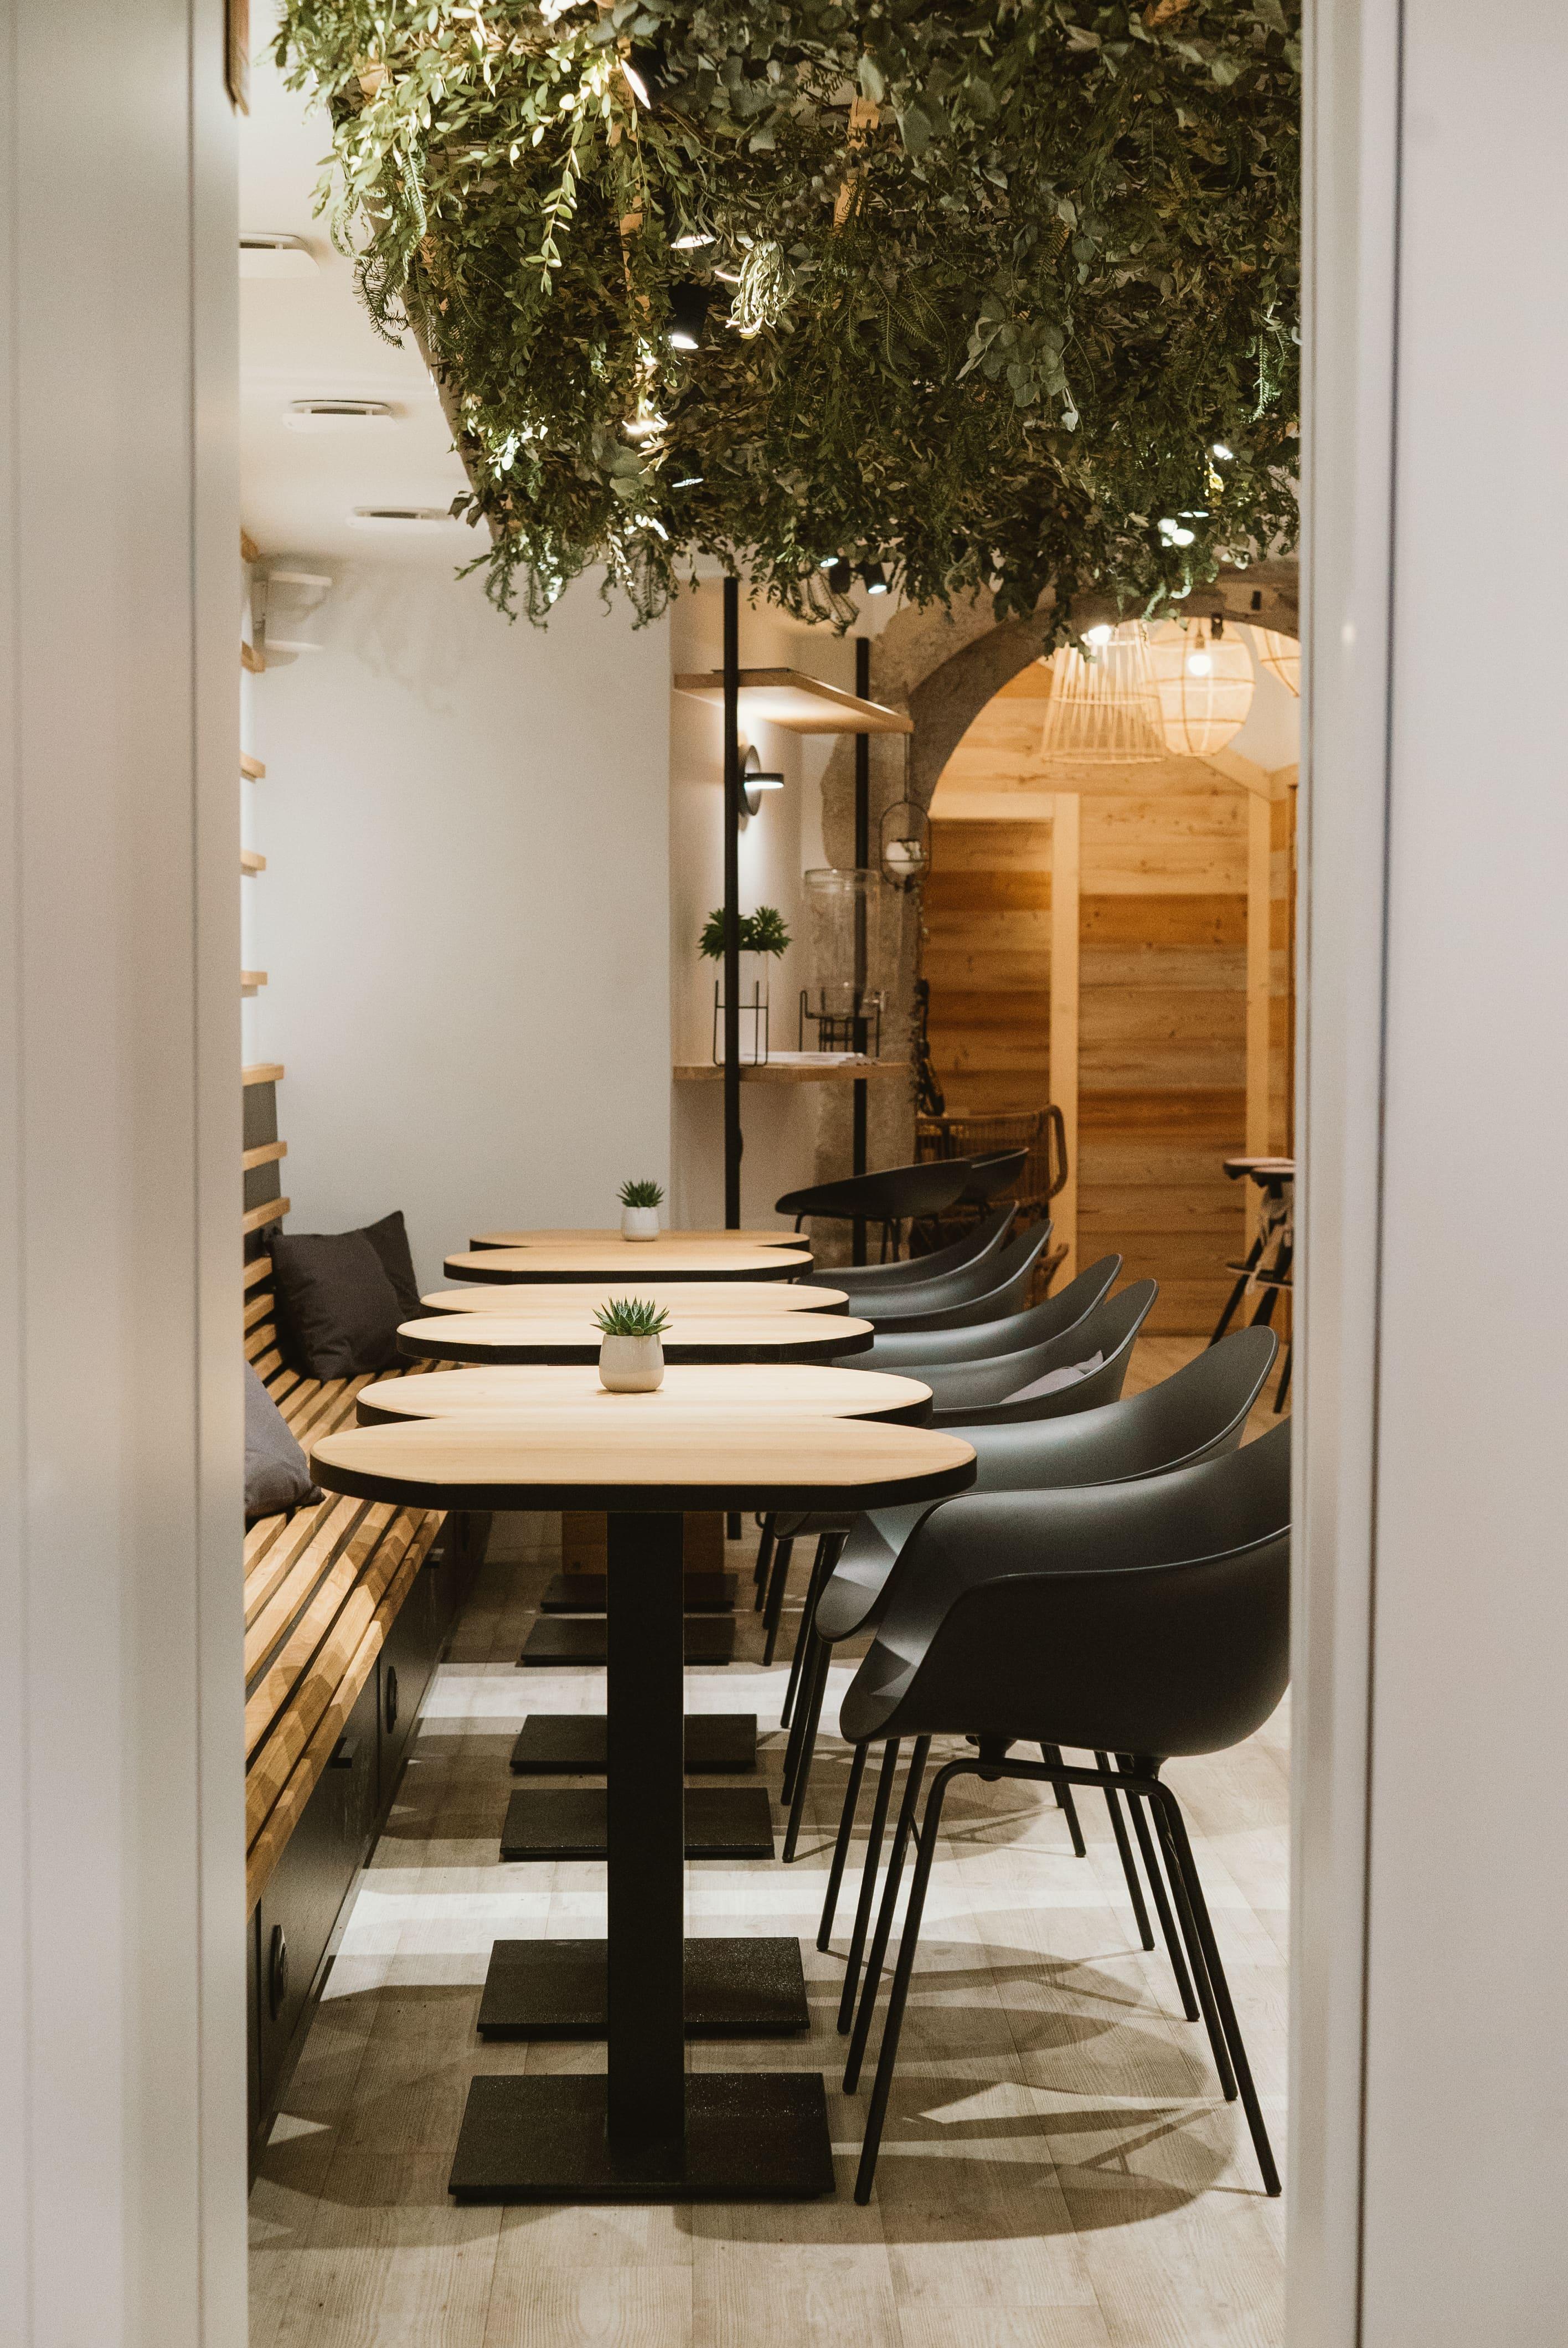 Agencement interieur design métallique ROBI restaurant Haven Annecy 74 agencement en metal 14